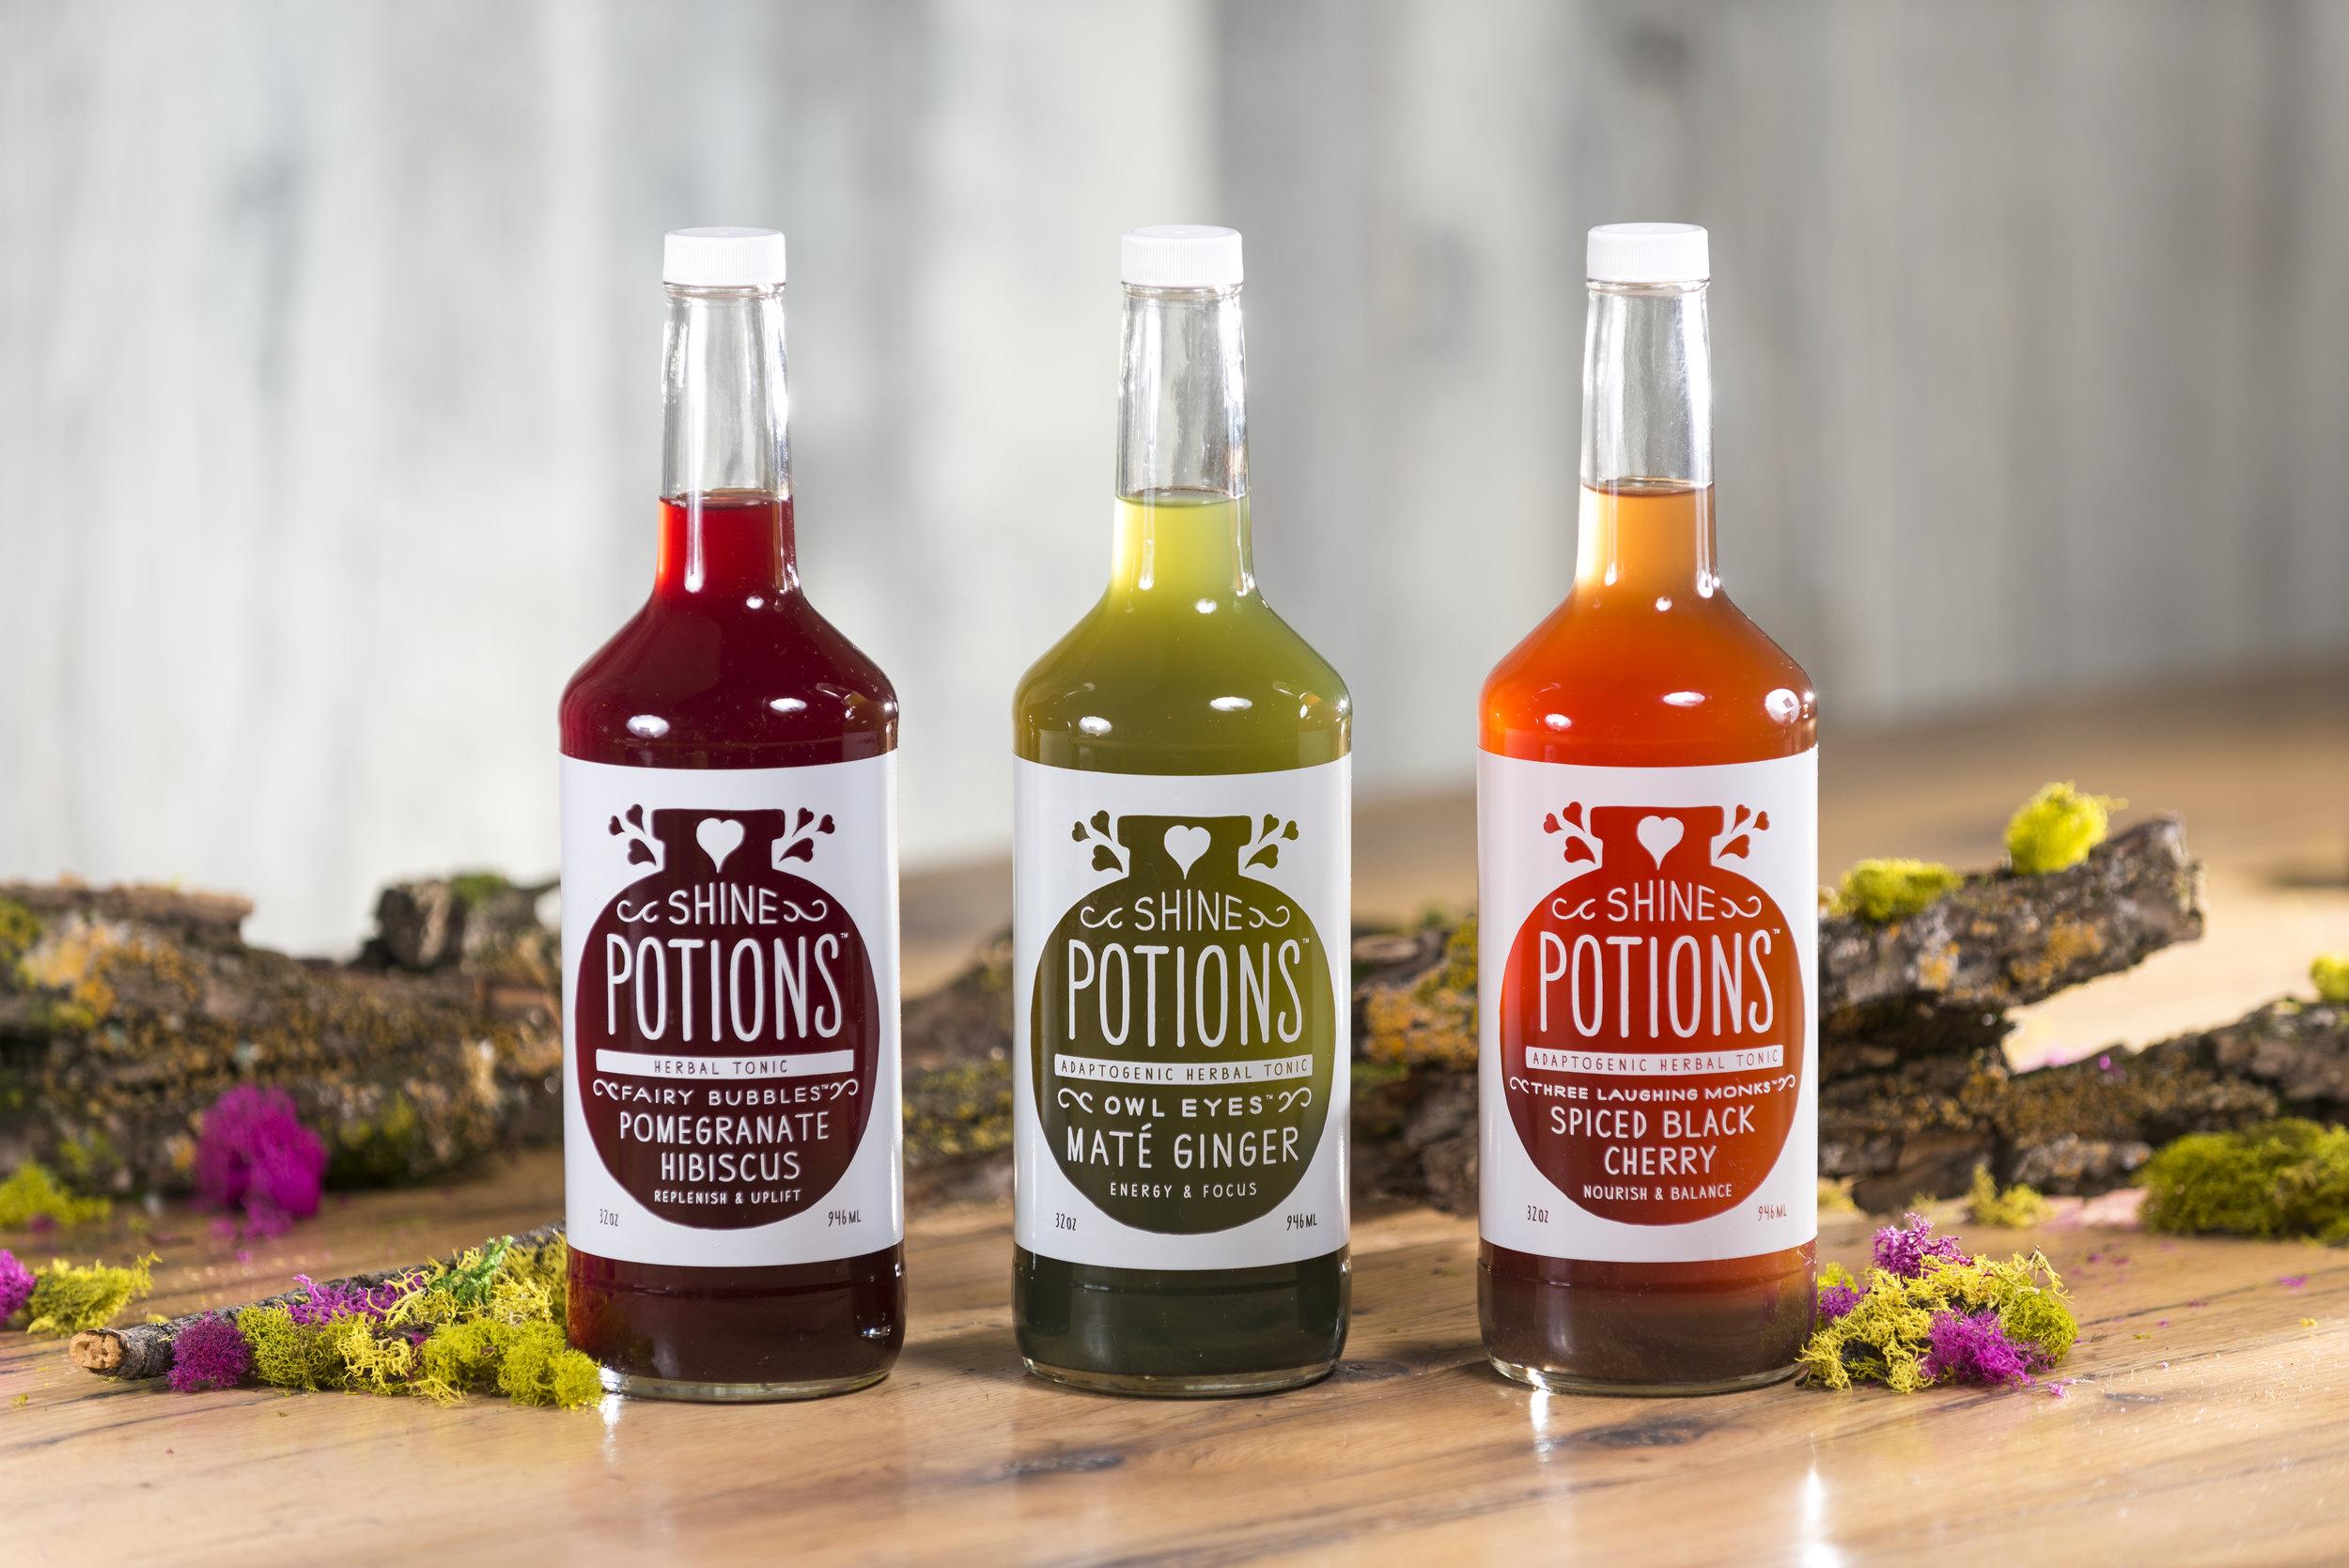 Shine Potions Launch on Amazon